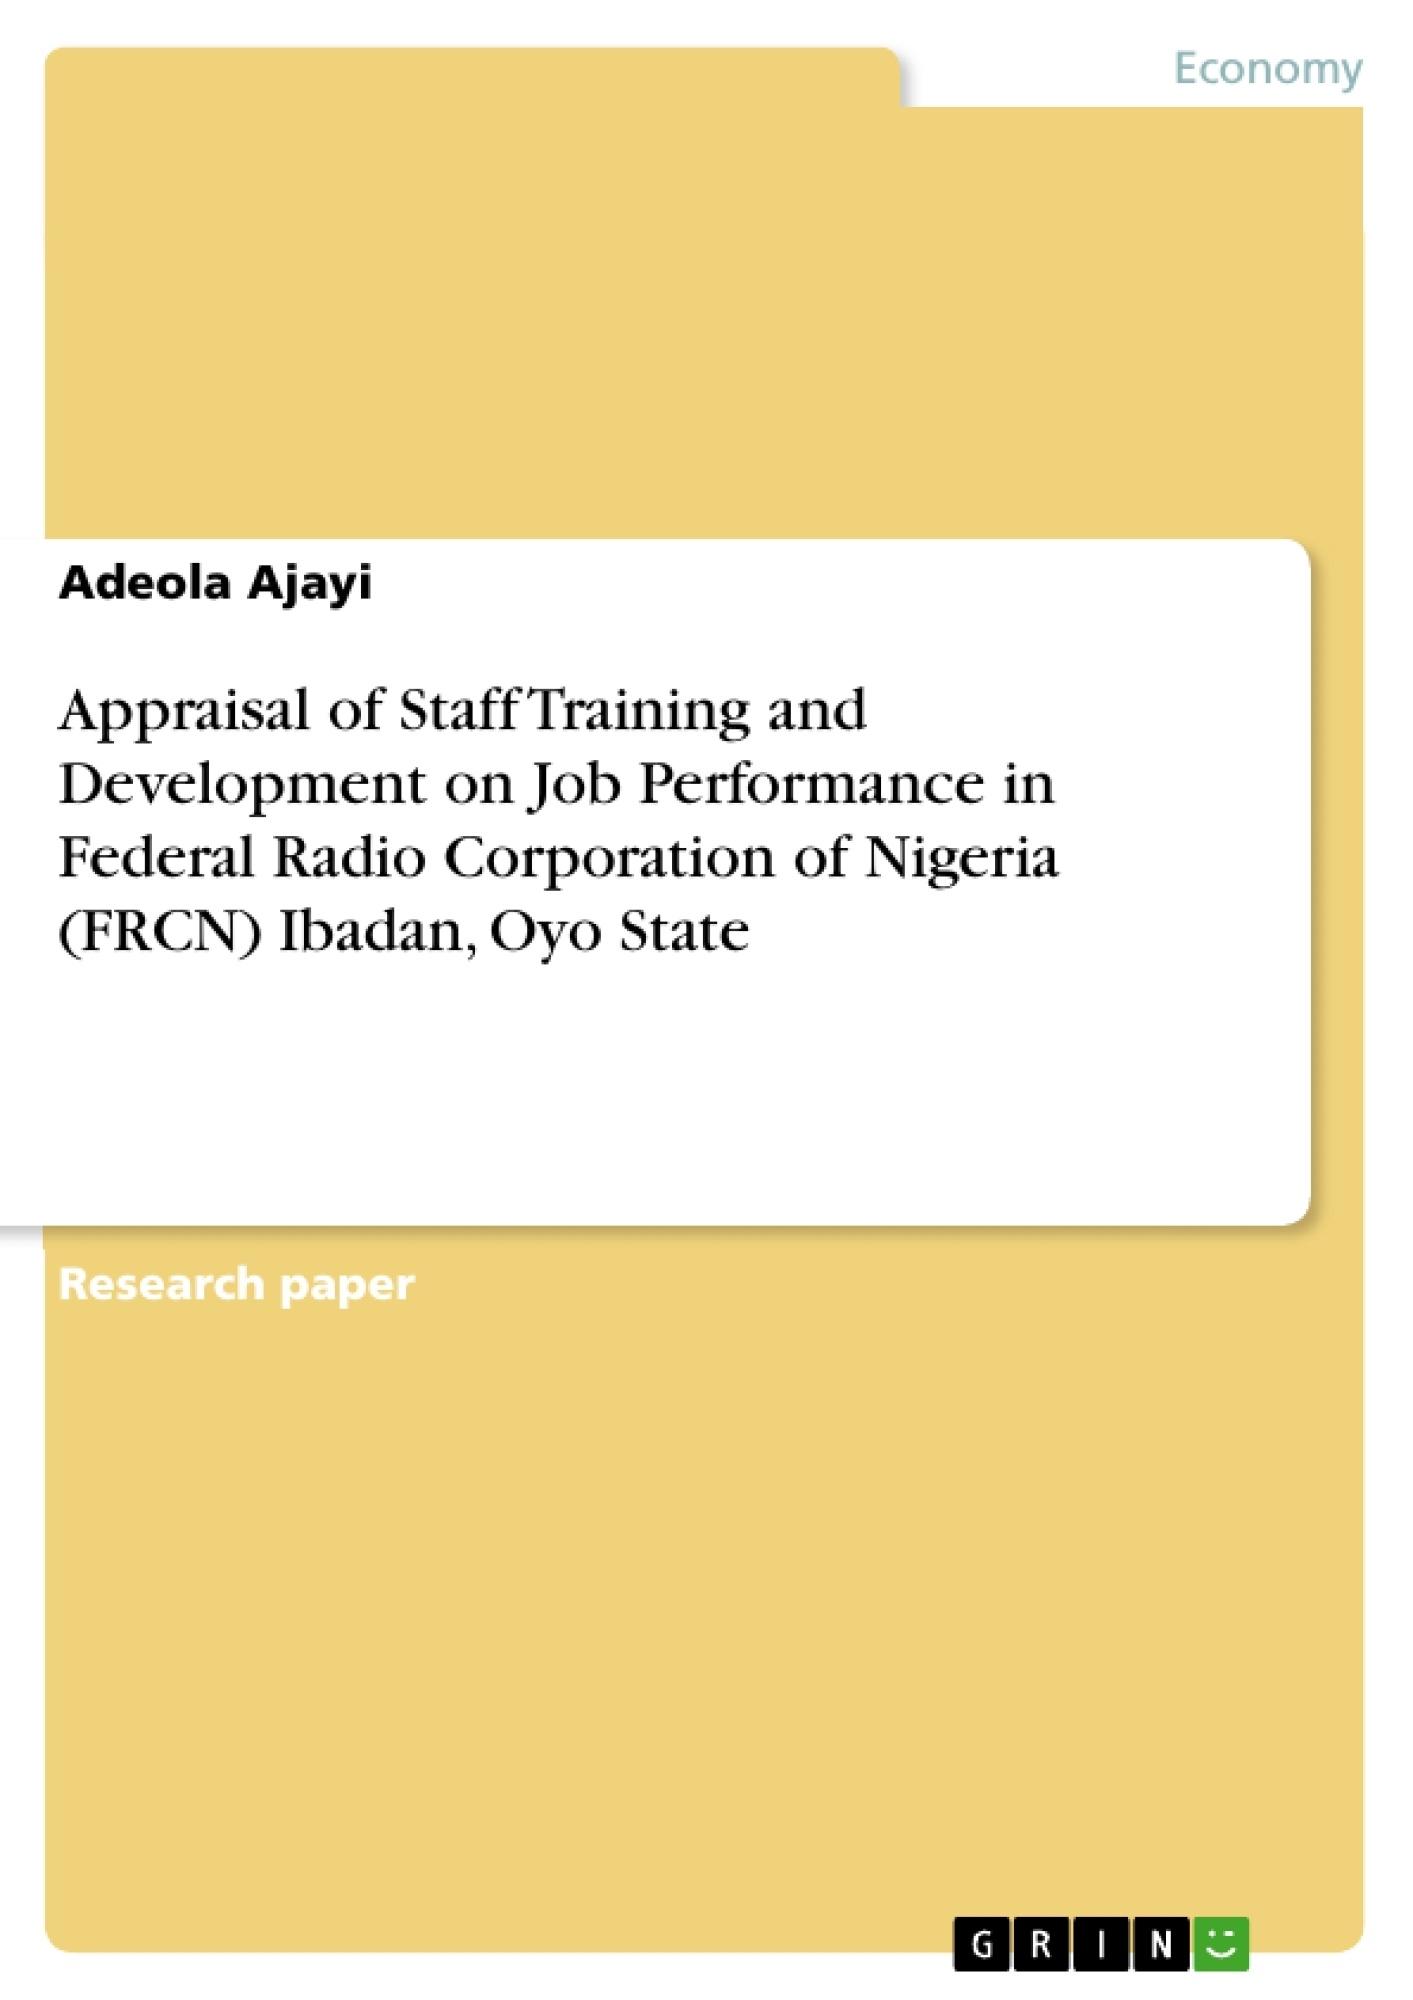 Title: Appraisal of Staff Training and Development on Job Performance in Federal Radio Corporation of Nigeria (FRCN) Ibadan, Oyo State